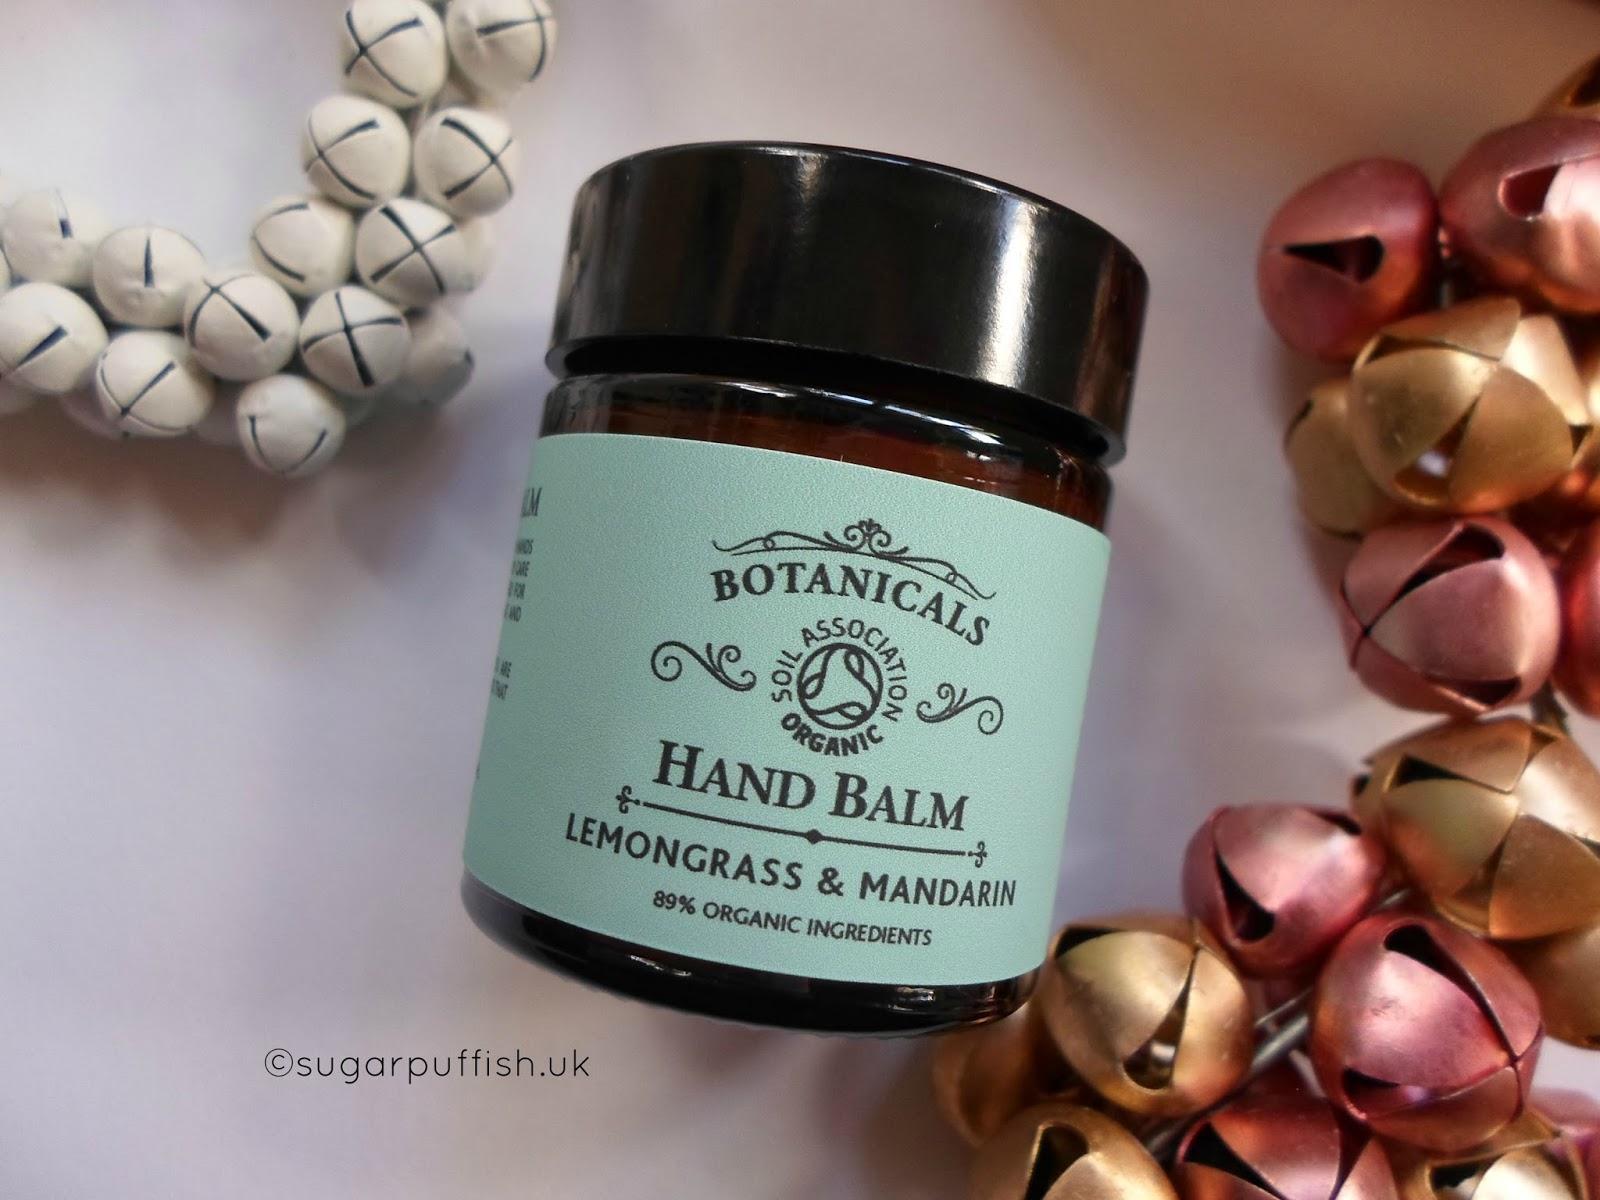 Botanicals Lemongrass & Mandarin Revitalising Hand Balm